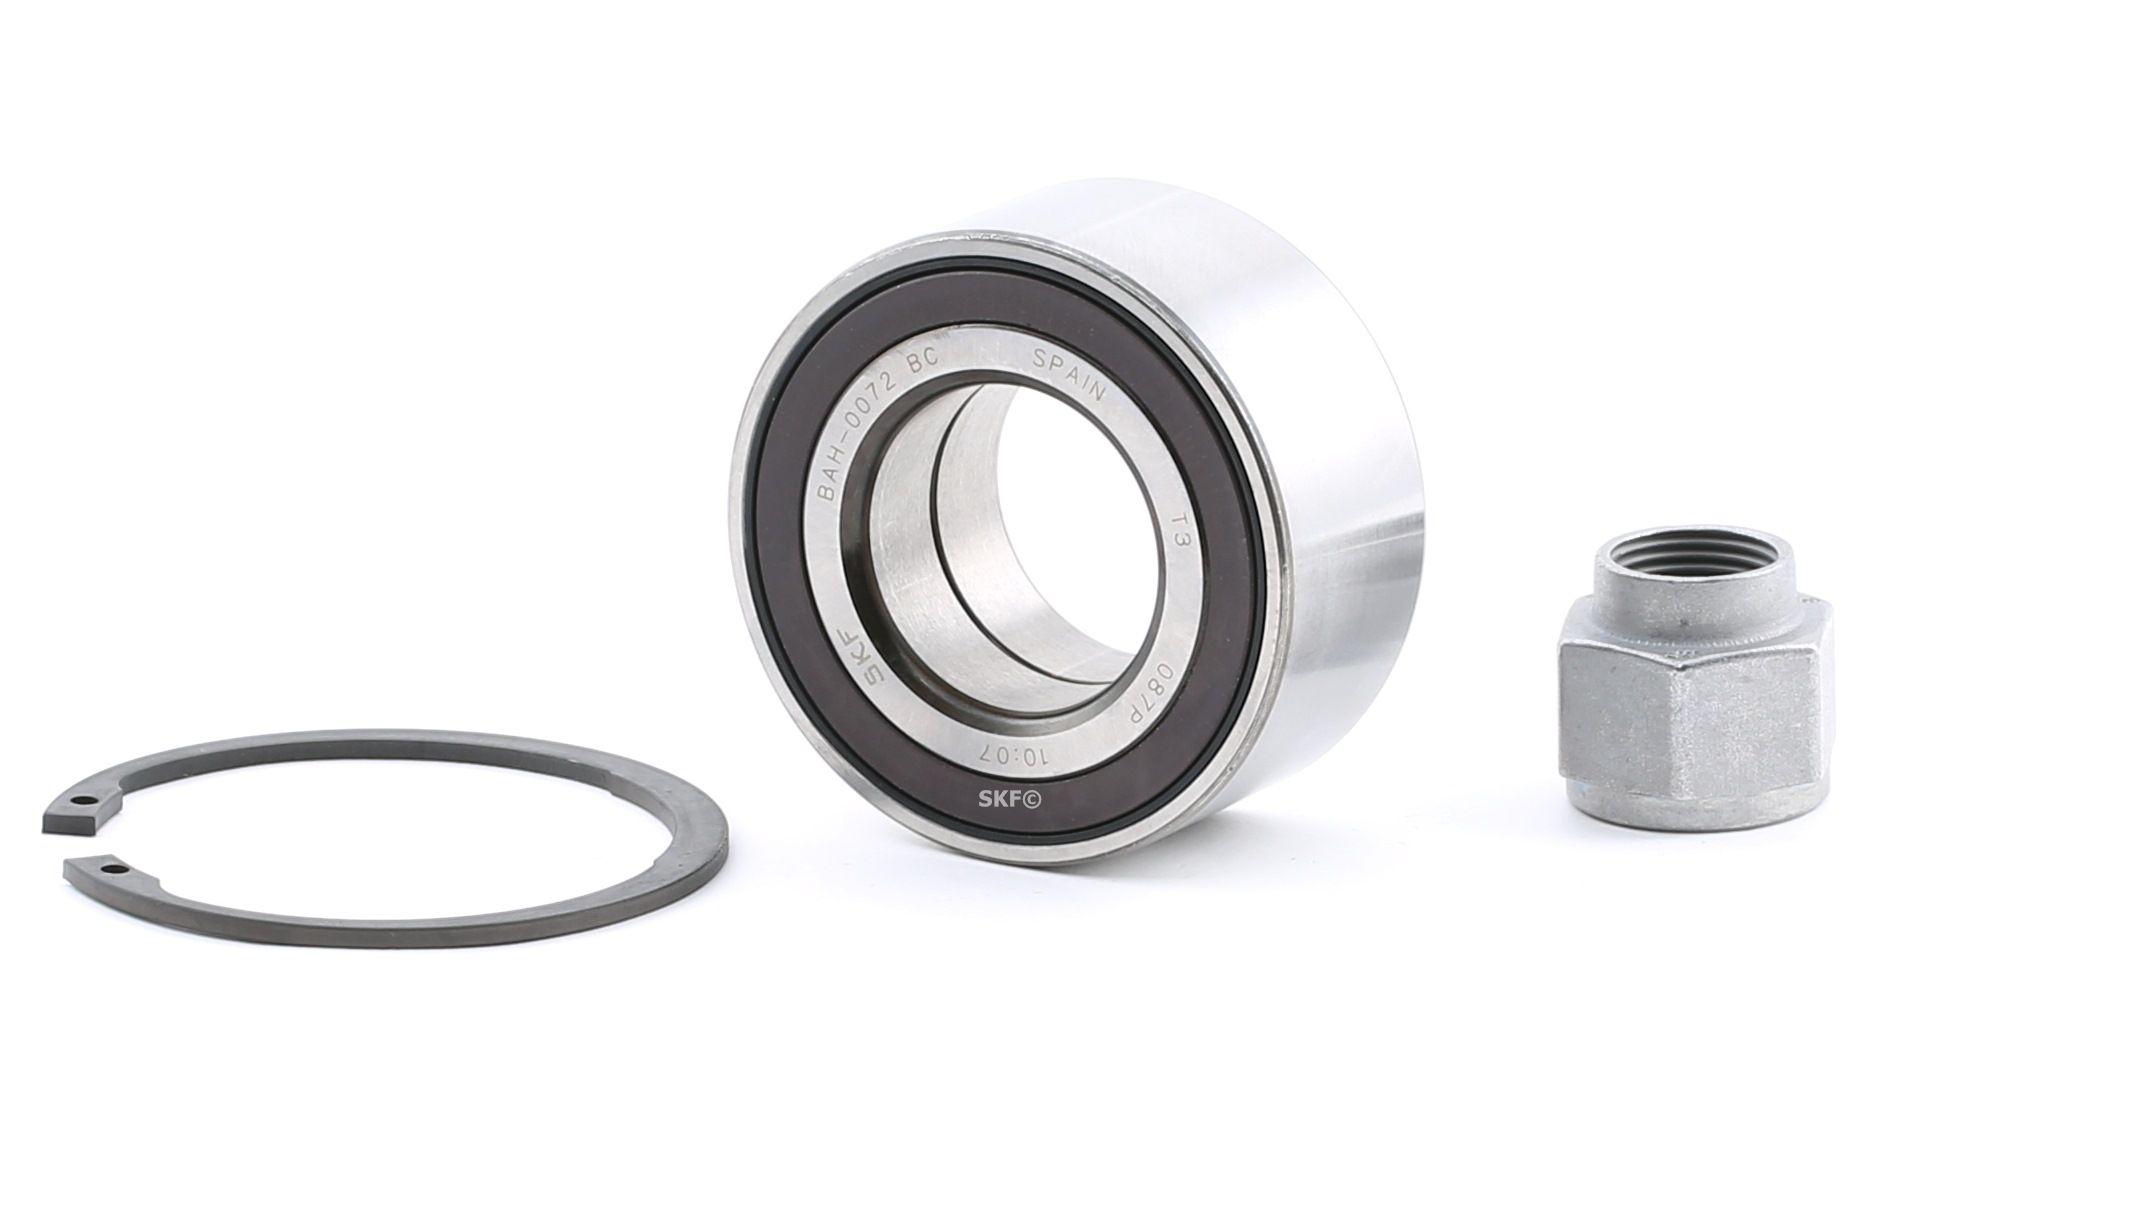 SKF: Original Radaufhängung & Lenker VKBA 3657 (Ø: 72mm, Innendurchmesser: 37mm)